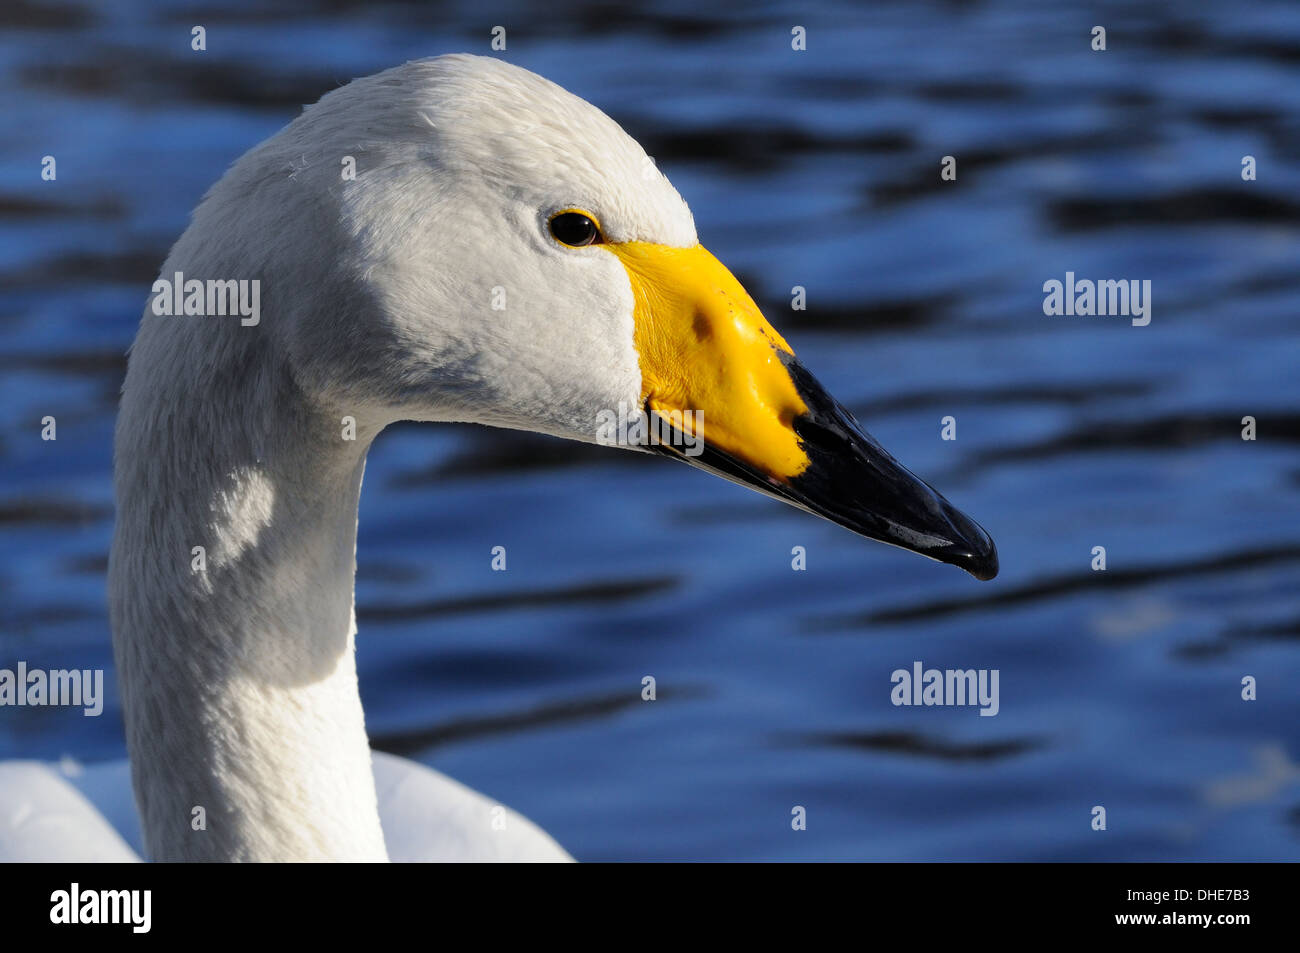 Whooper swan (Cygnus cygnus) head portrait, Regent's Park boating lake, London, UK, January. - Stock Image